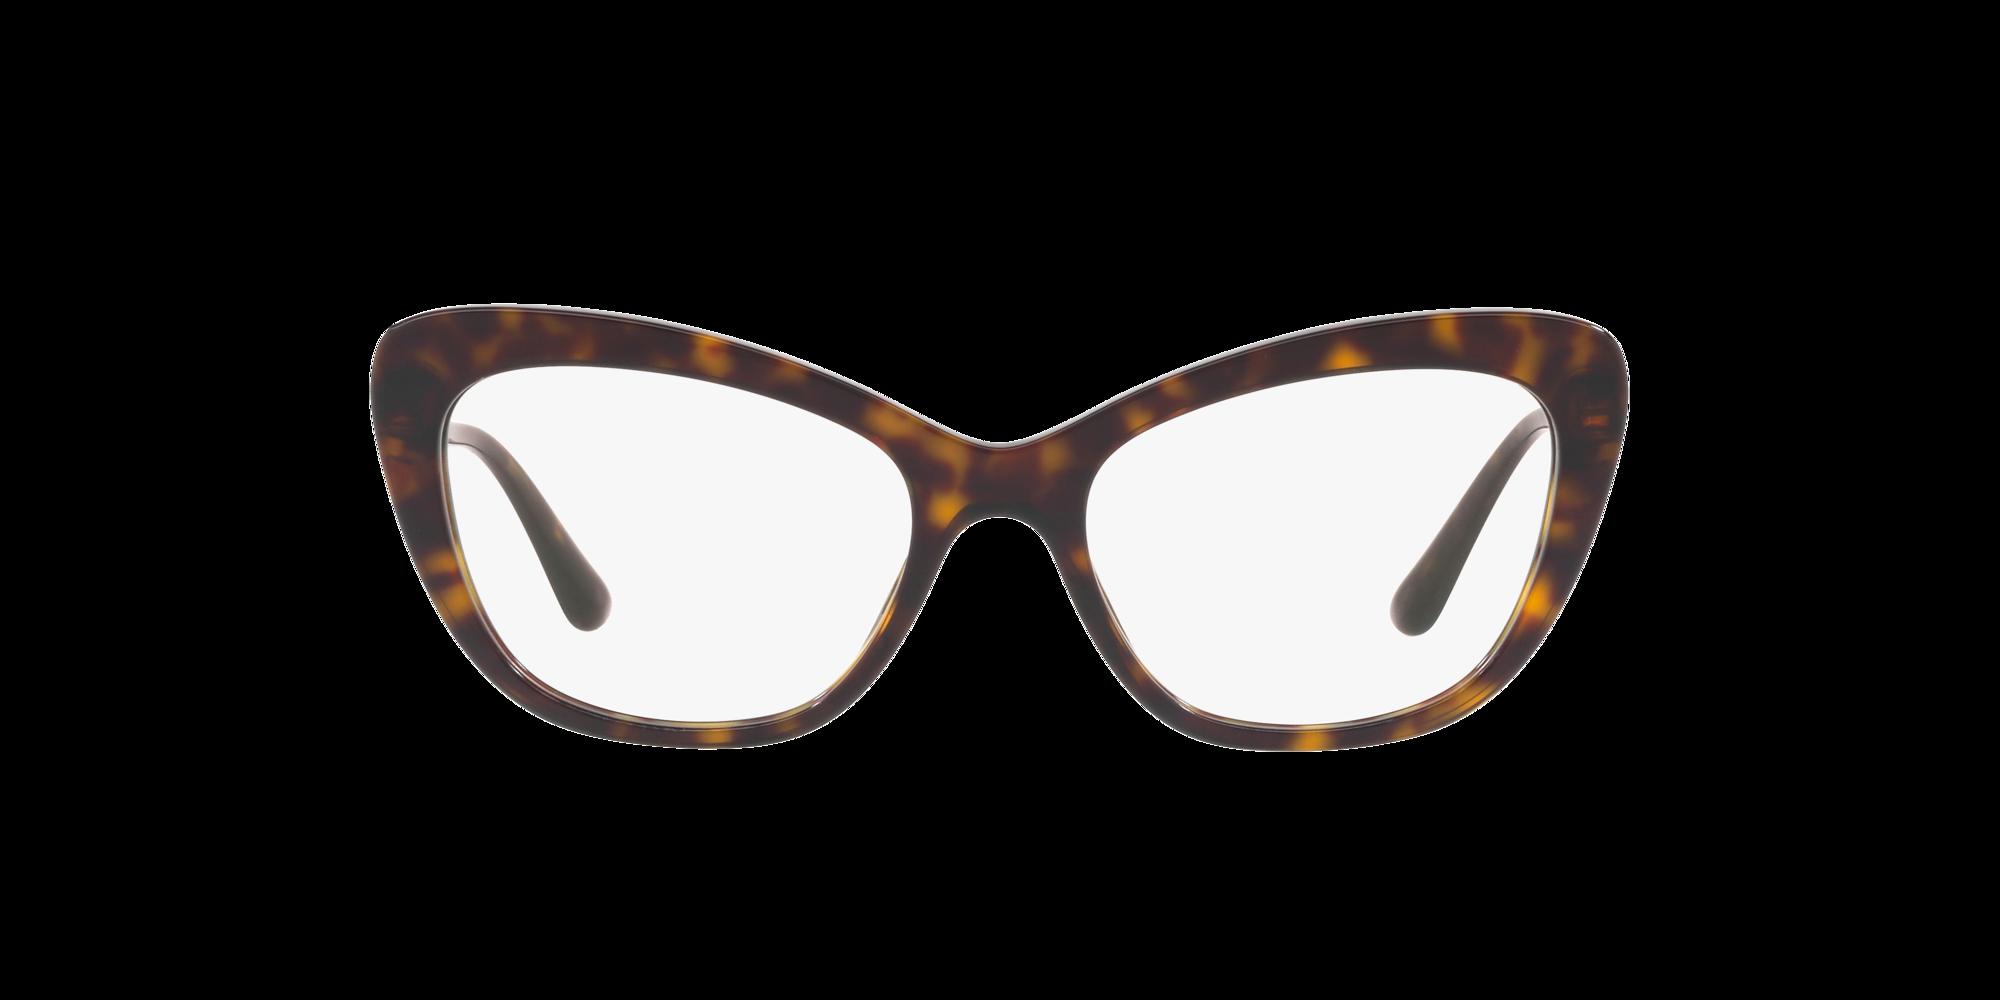 Image for DG3275B from LensCrafters | Glasses, Prescription Glasses Online, Eyewear